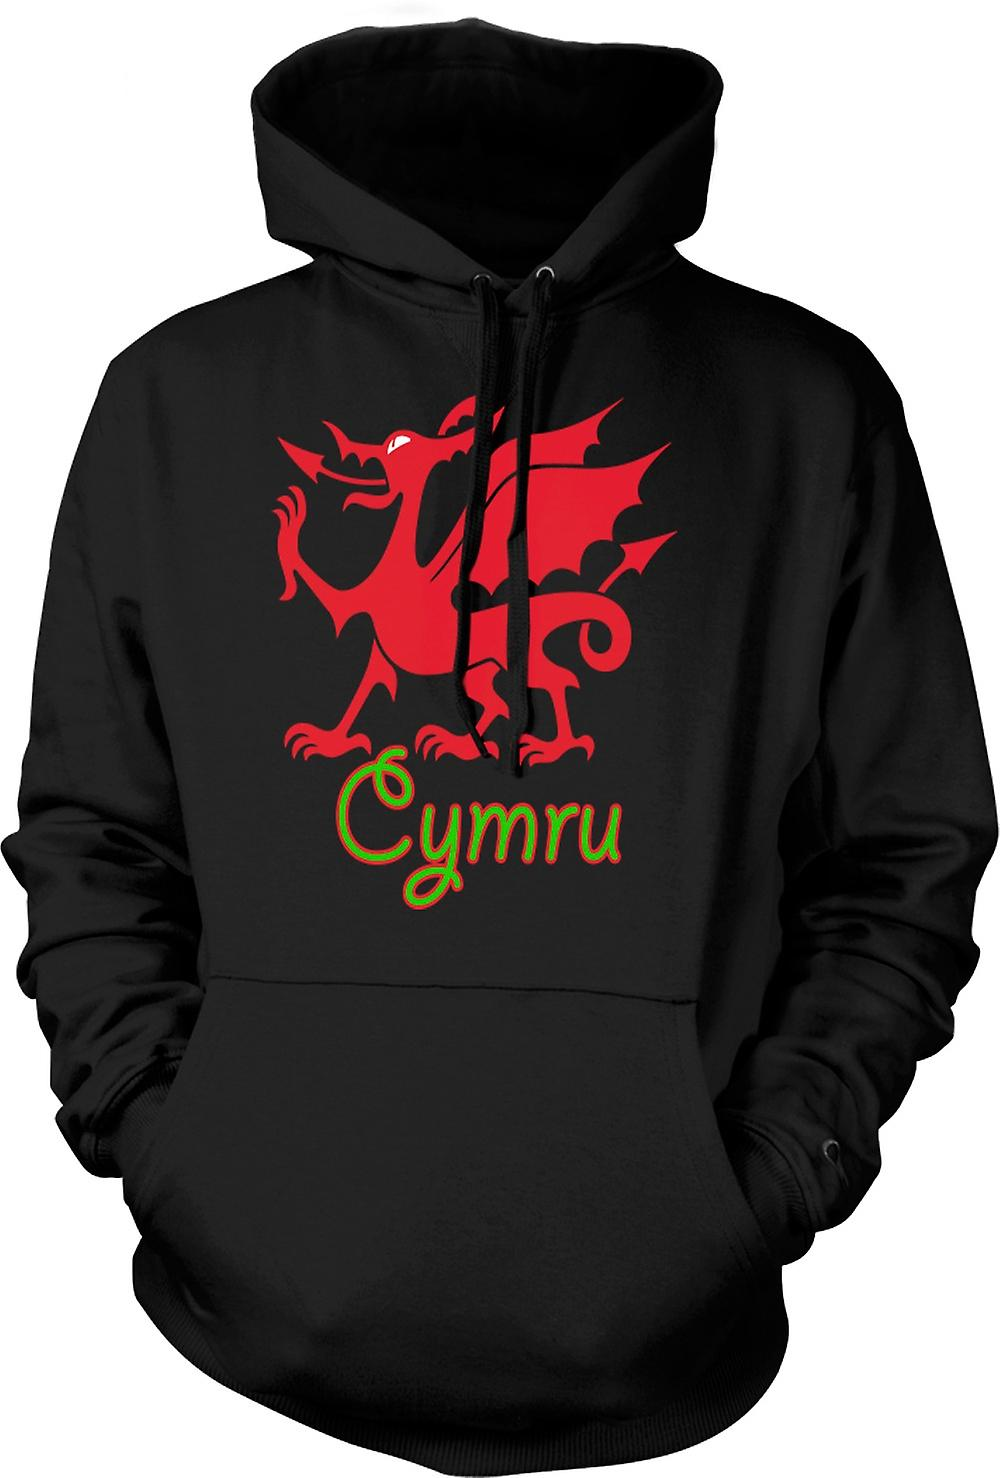 Mens Hoodie - Dragon gallois - Cymru